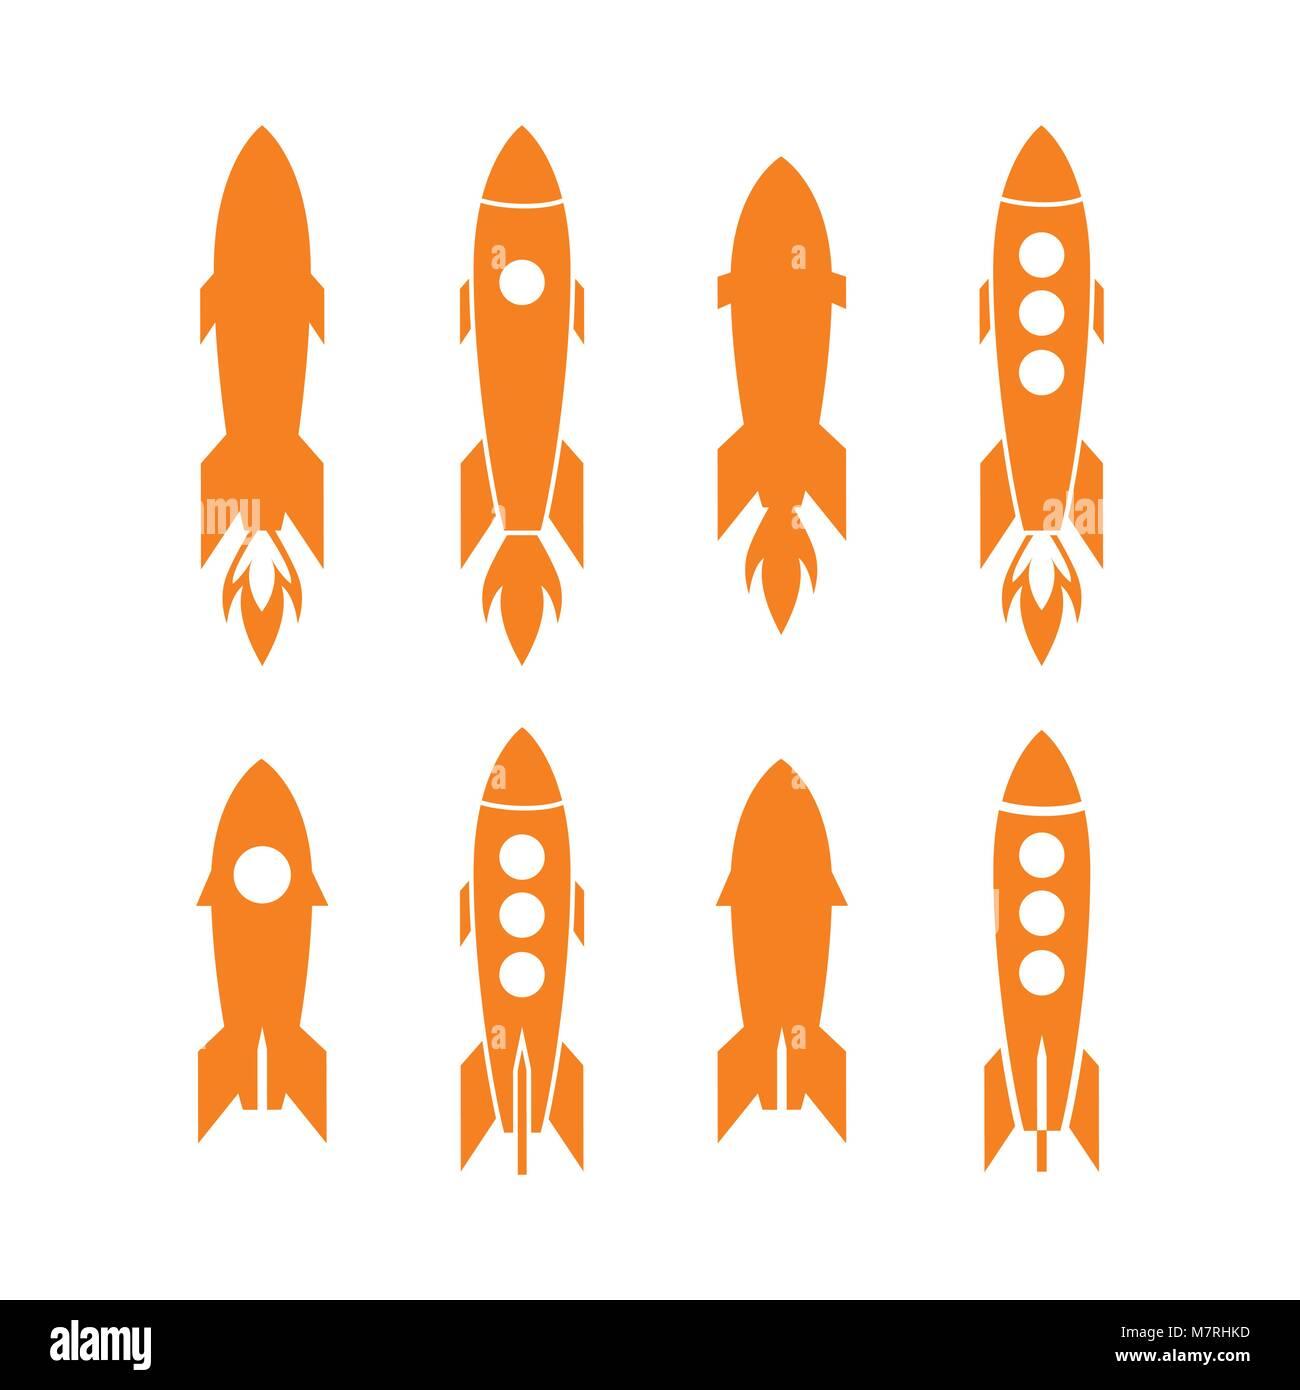 Rocket icon and rocket silhouette vector set. Icon design rocket, spaceships, rocket ship - Stock Vector